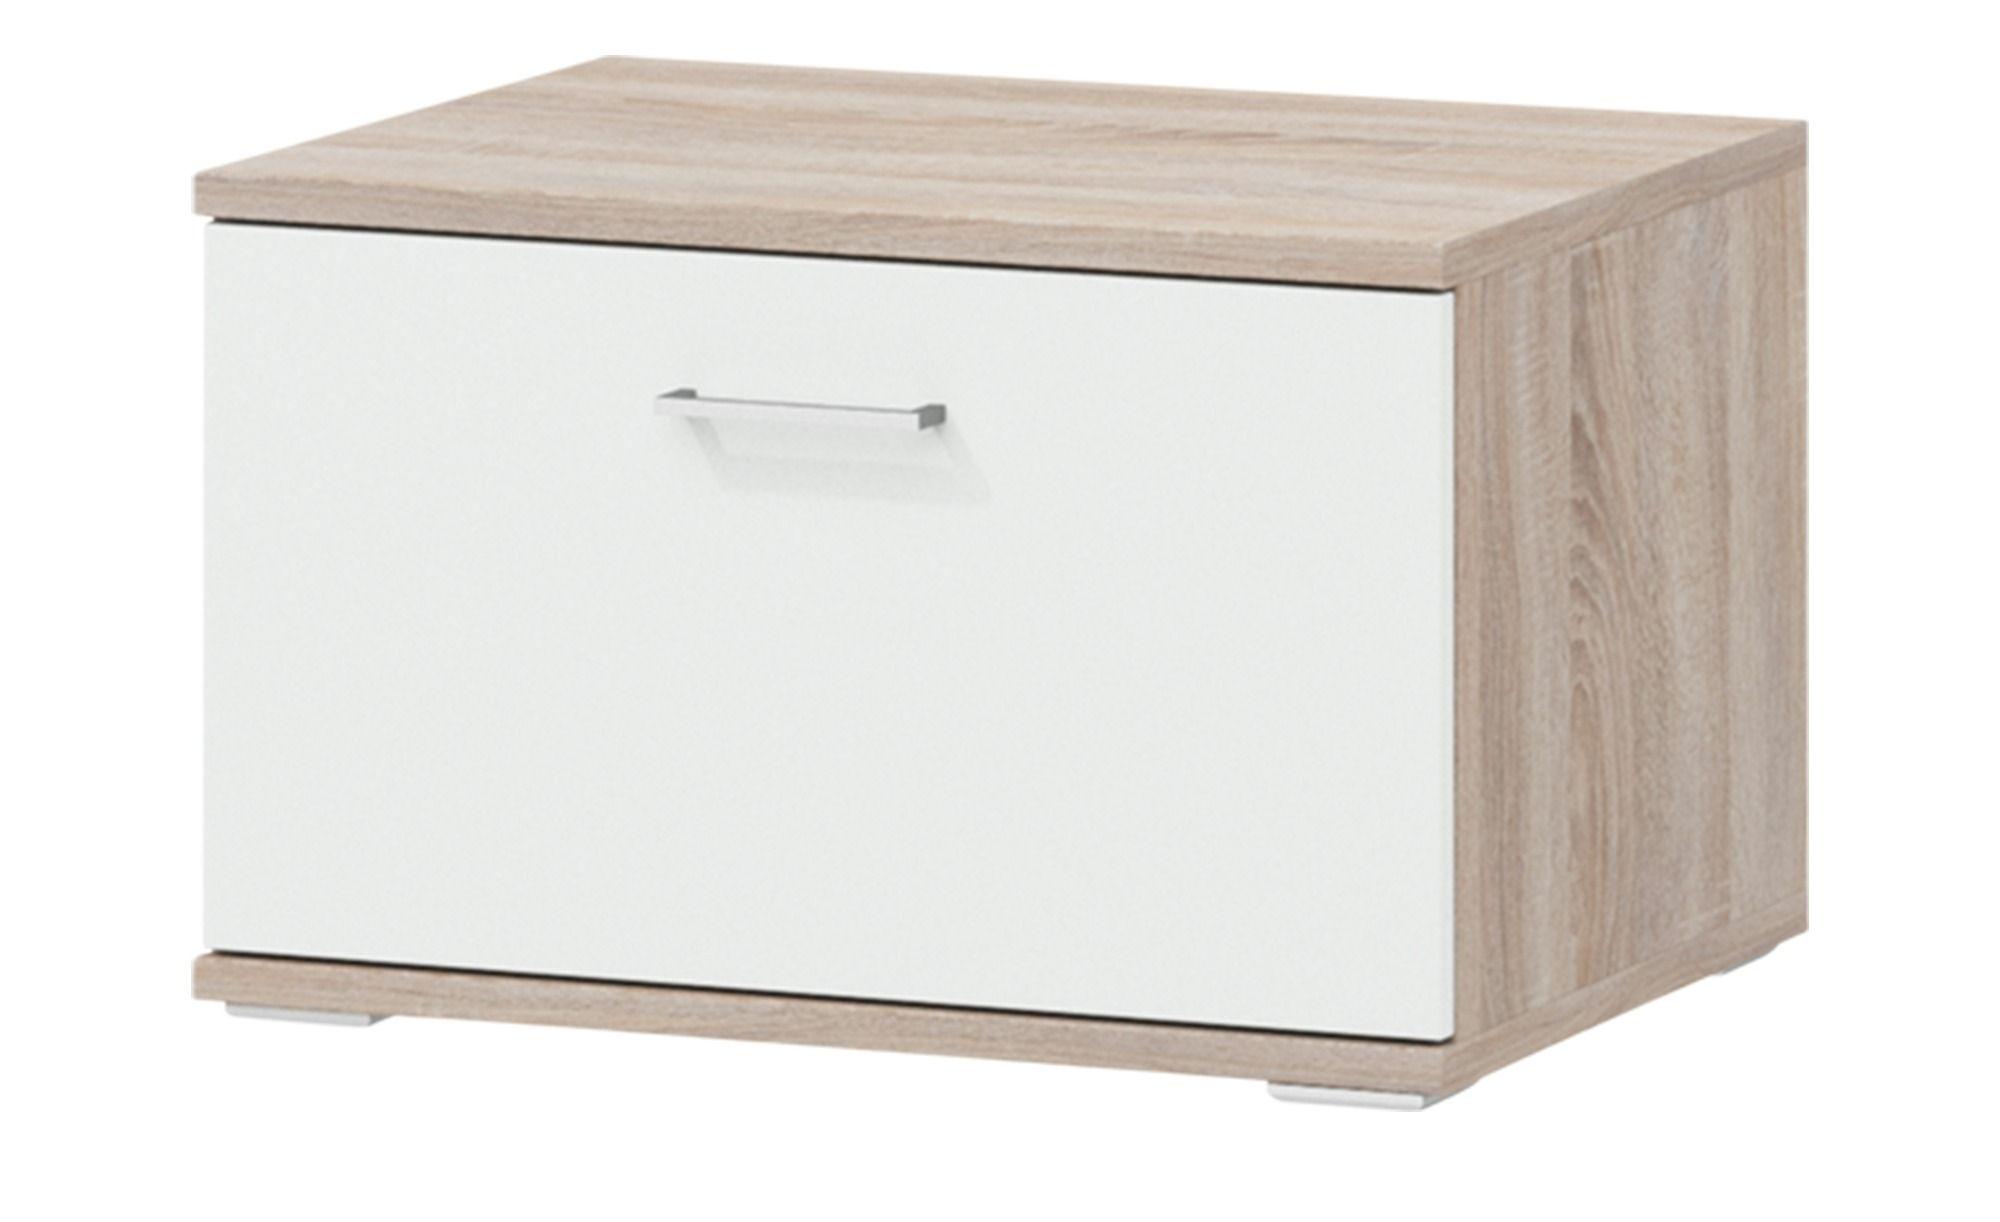 Uno Lowboard Onyx Schrank Lowboard Und Kommode Sideboard